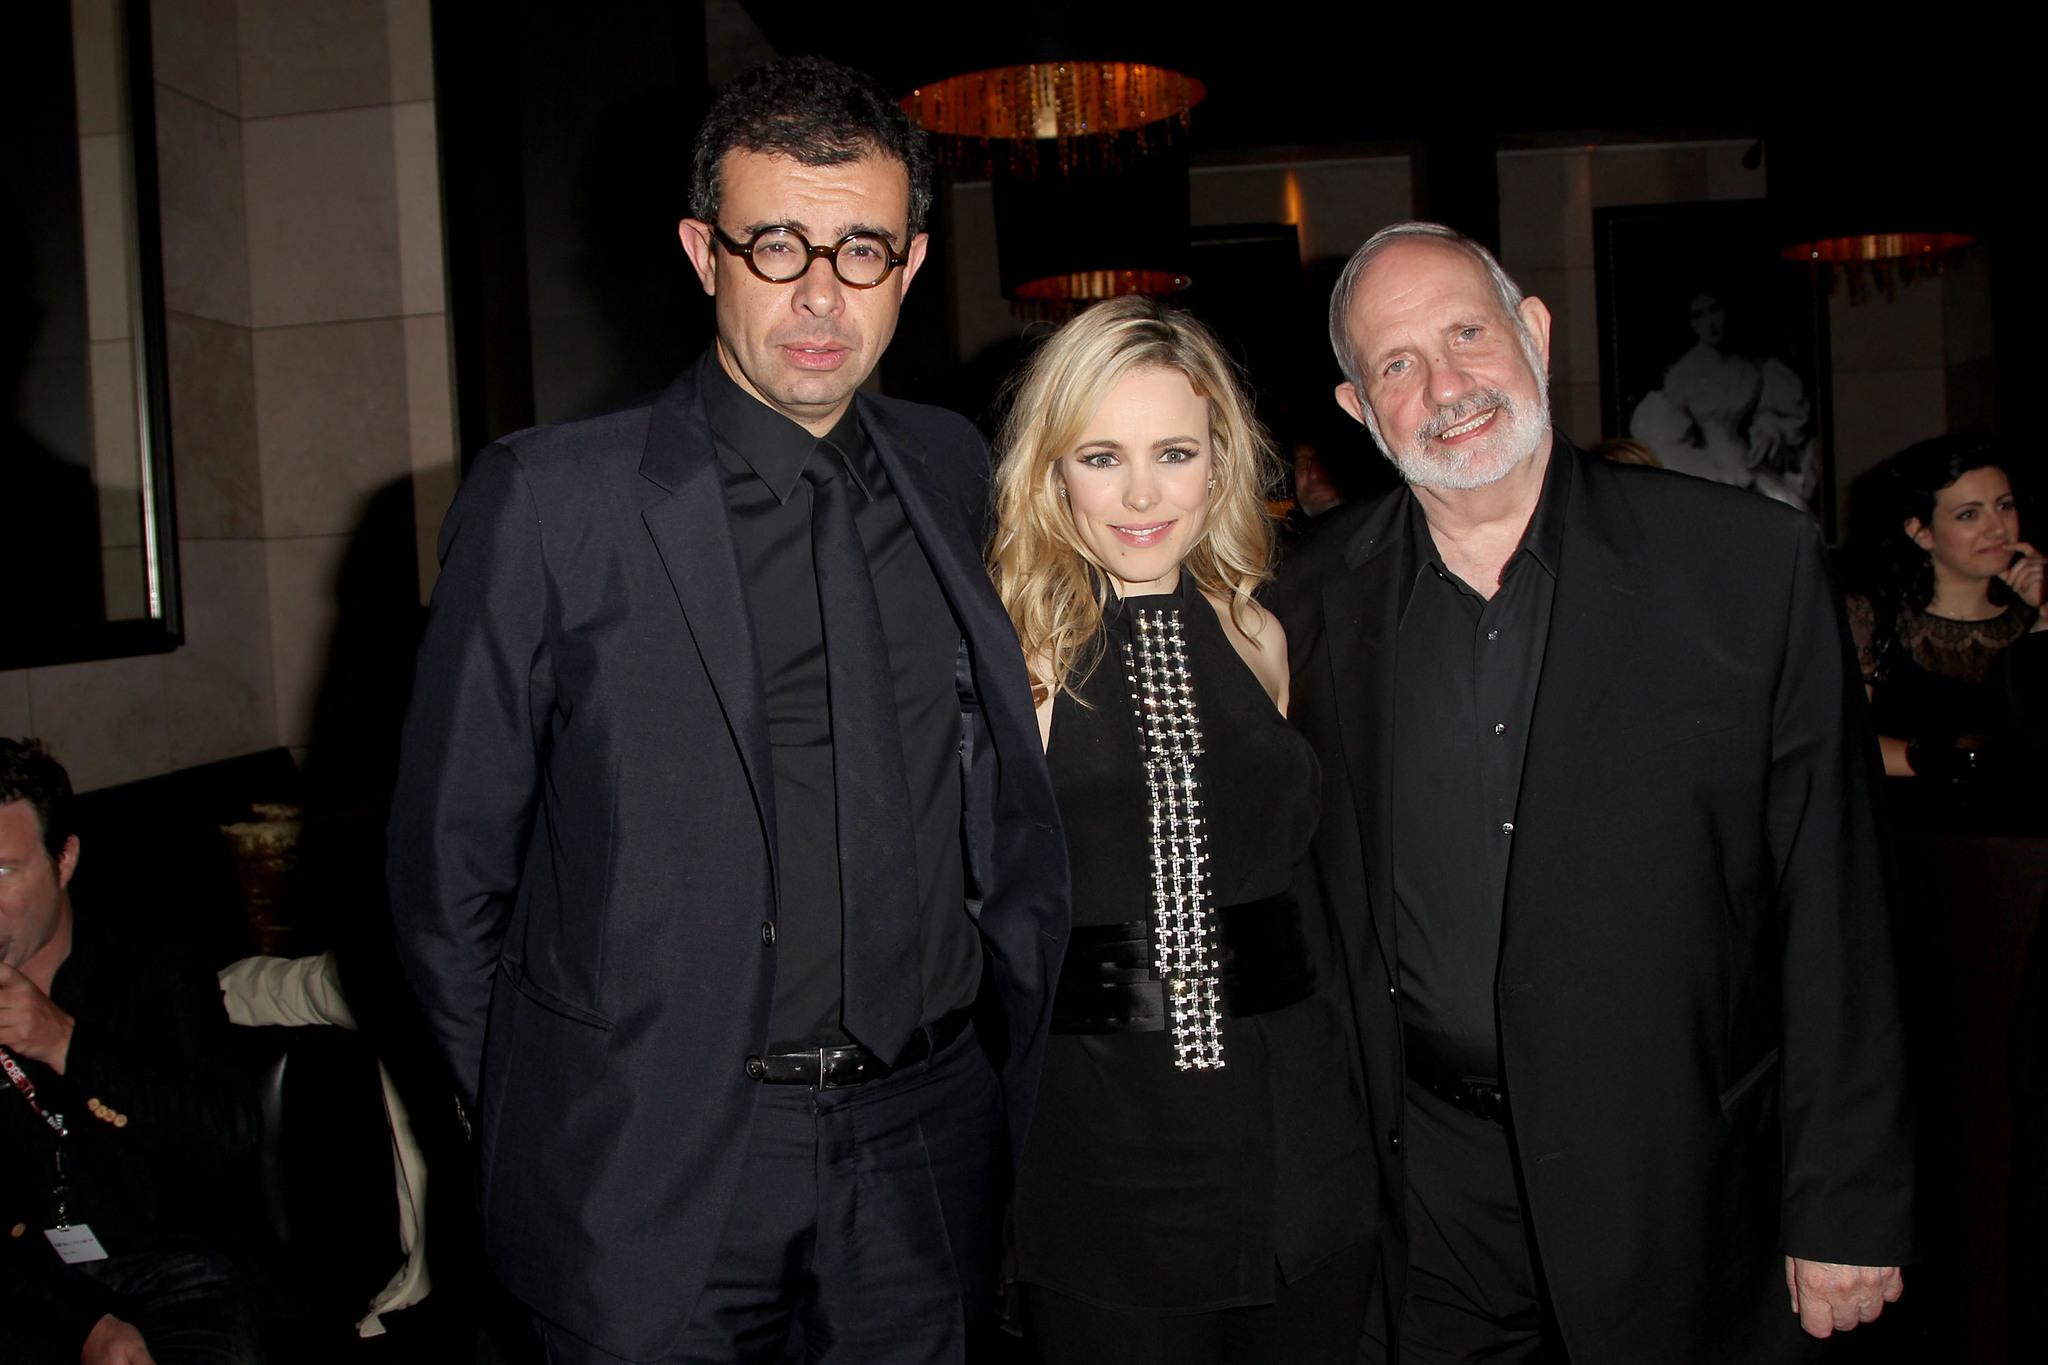 Brian De Palma, Saïd Ben Saïd, and Rachel McAdams at an event for Passion (2012)